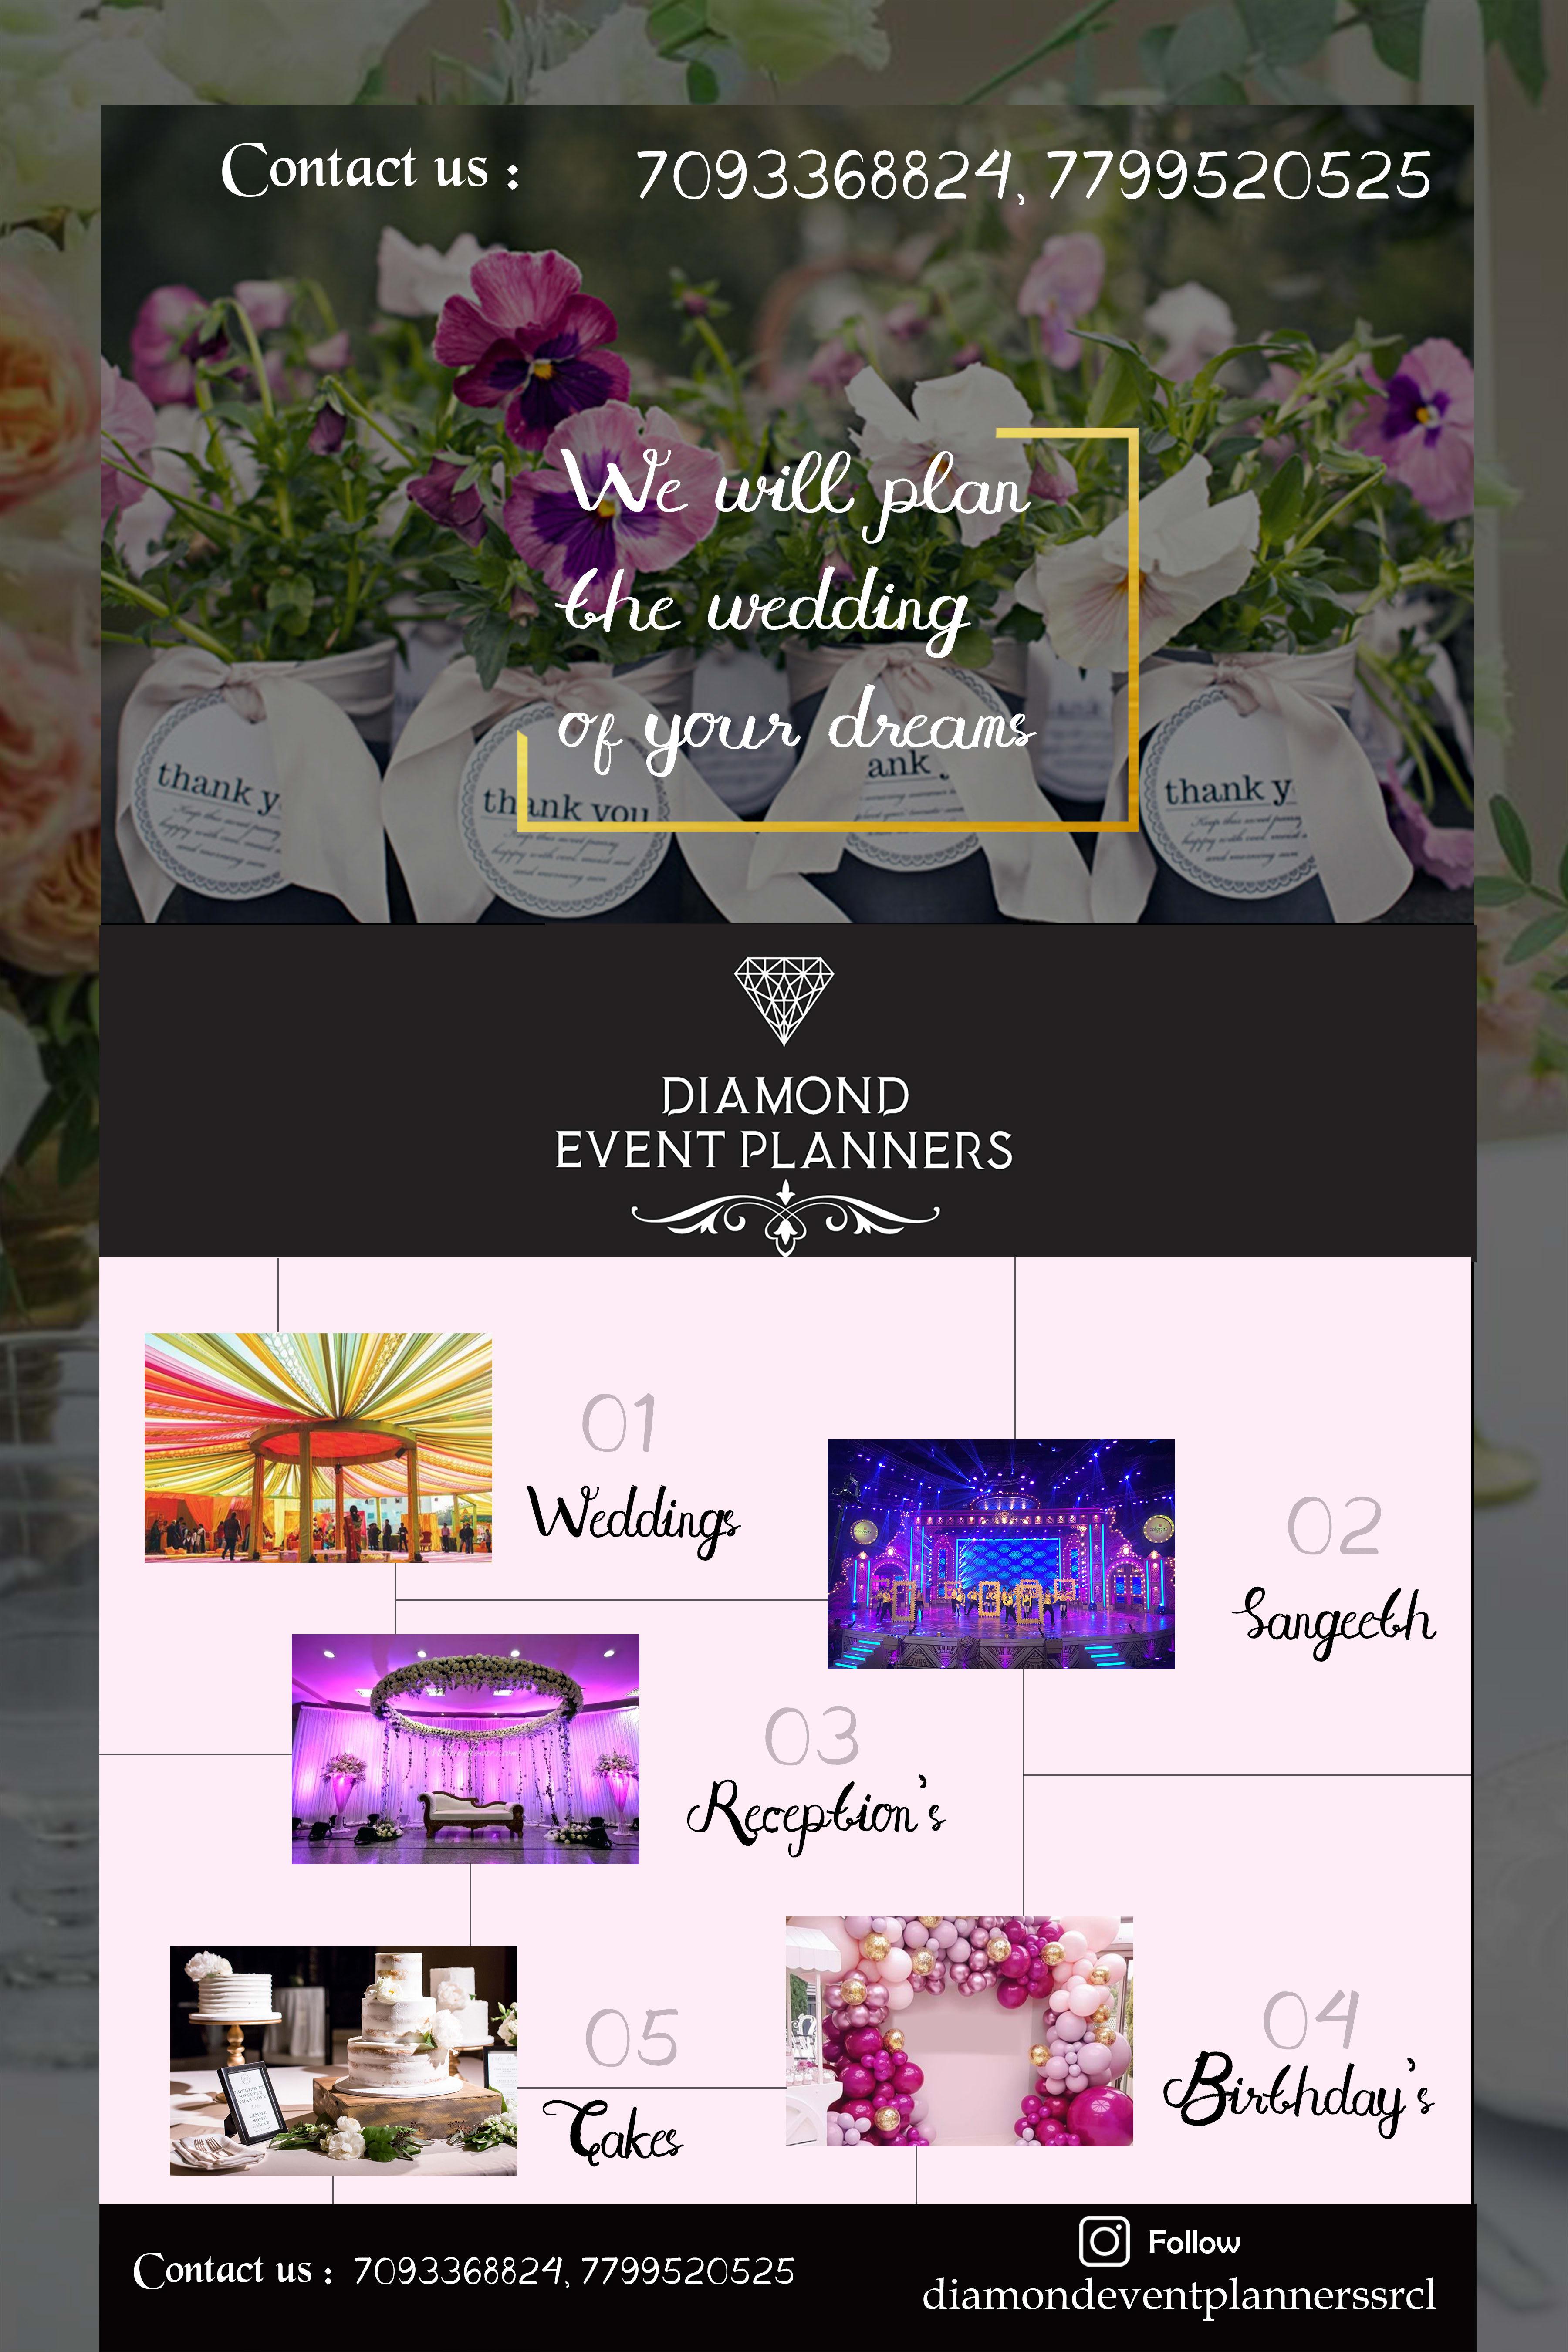 Diamond Event Planners